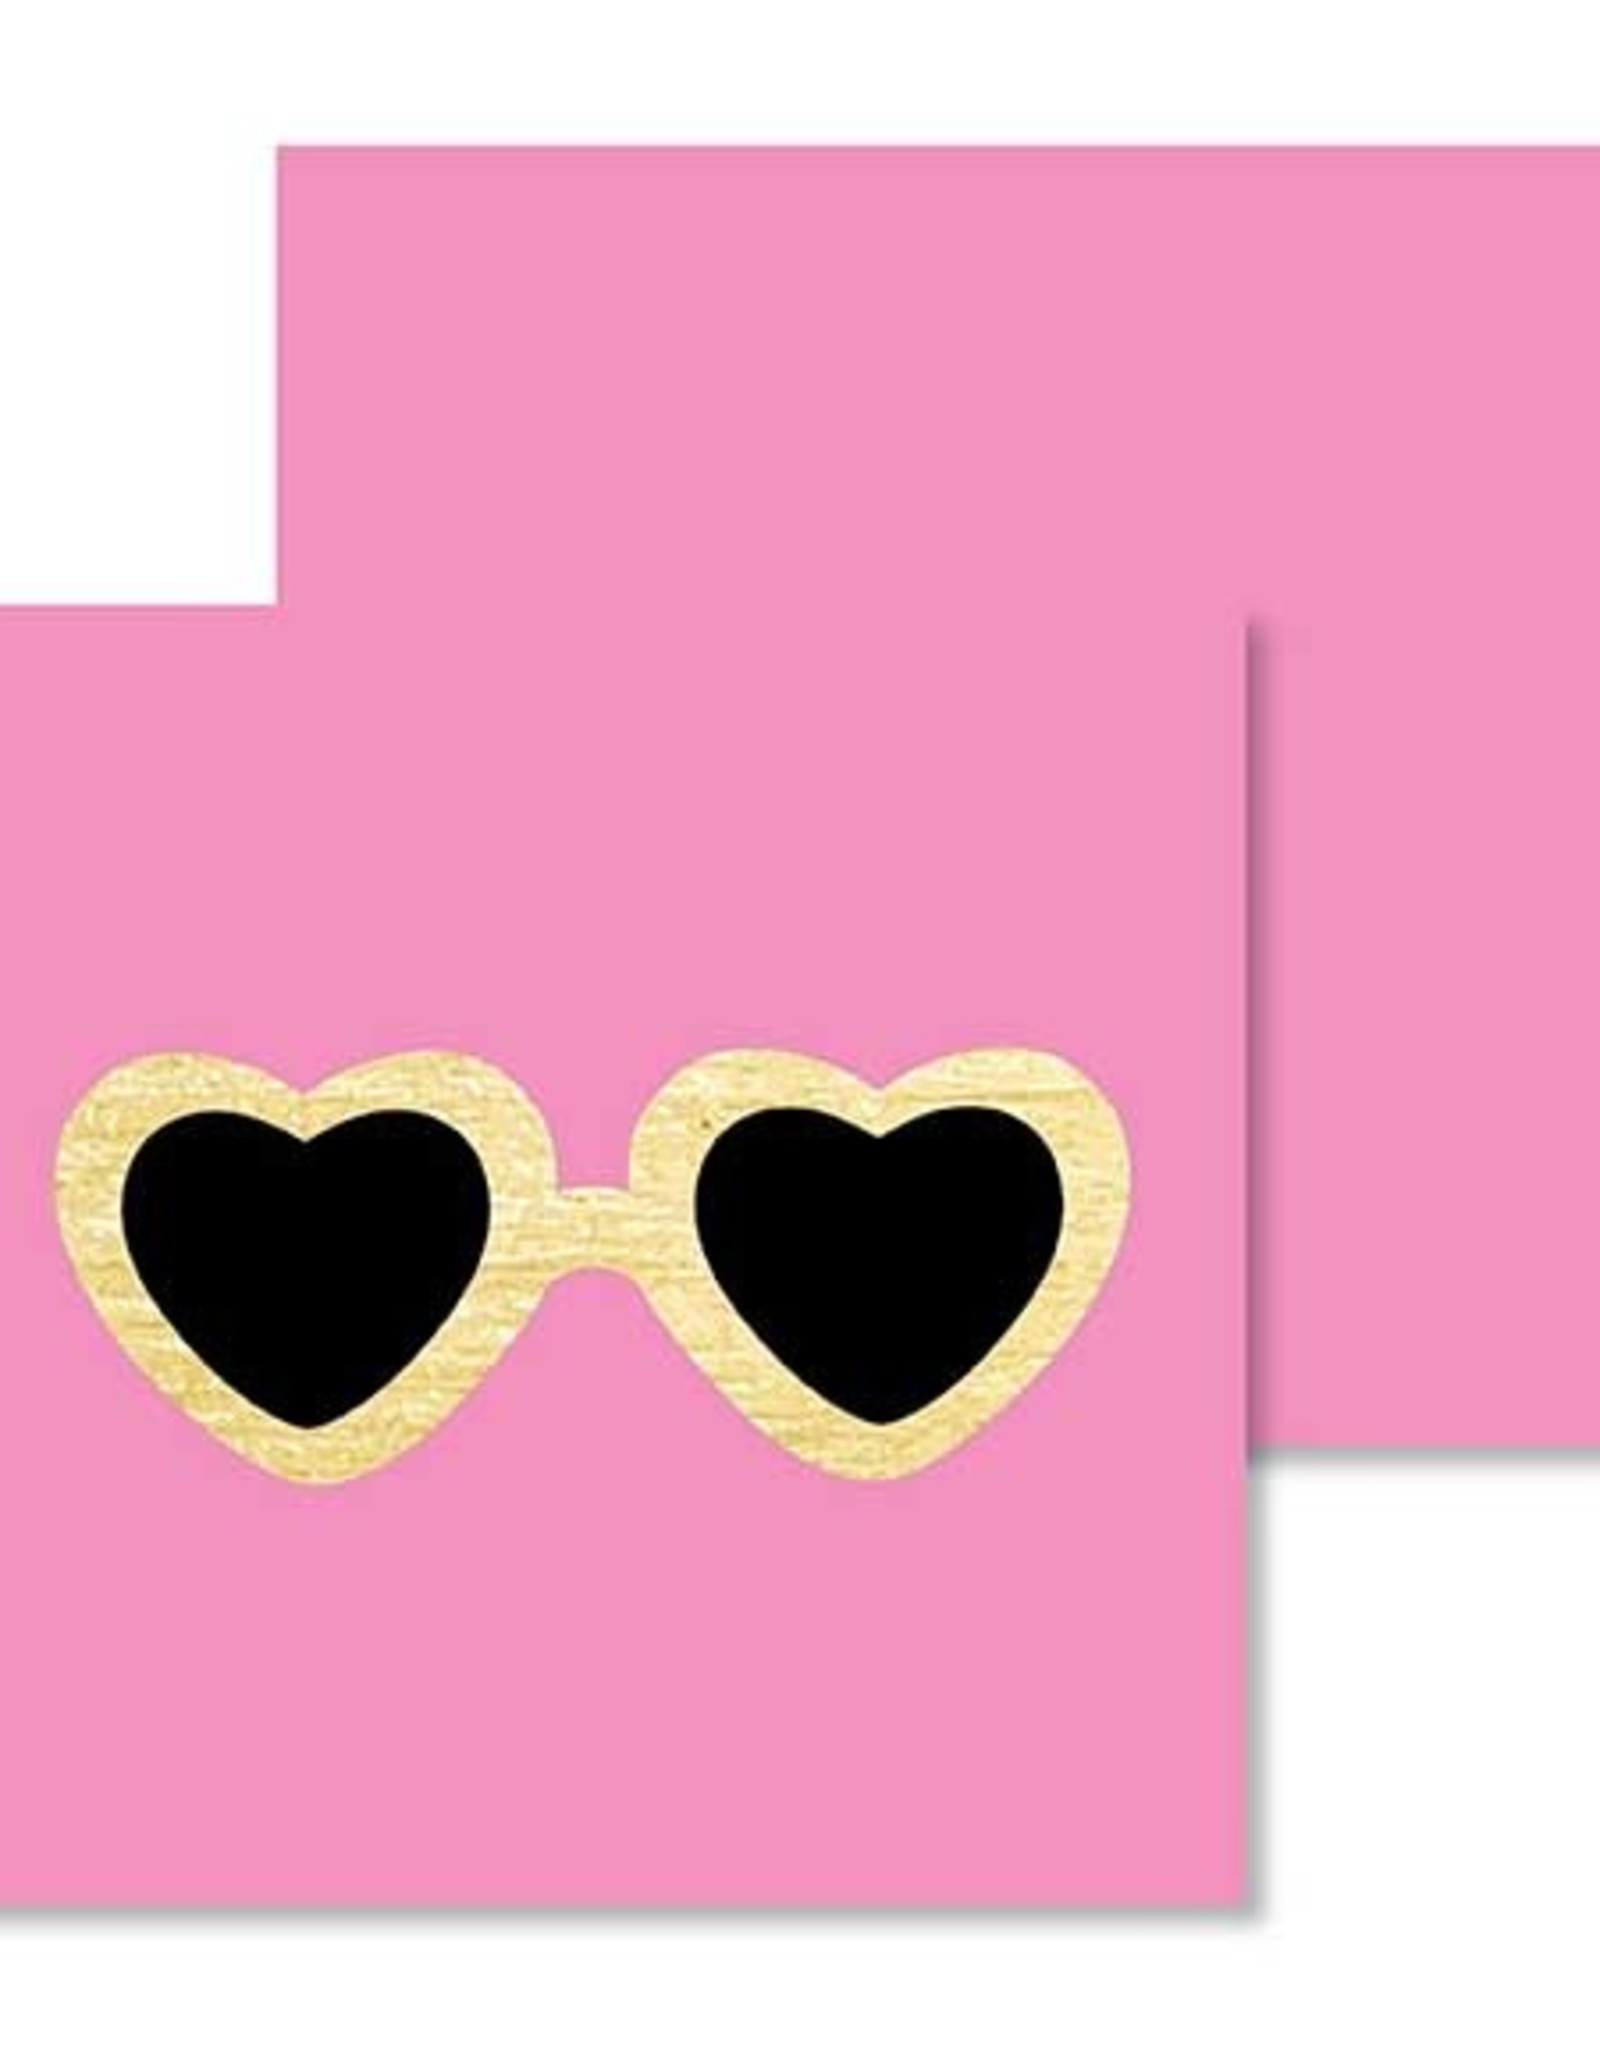 Mini Enclosure Card - Heart Glasses